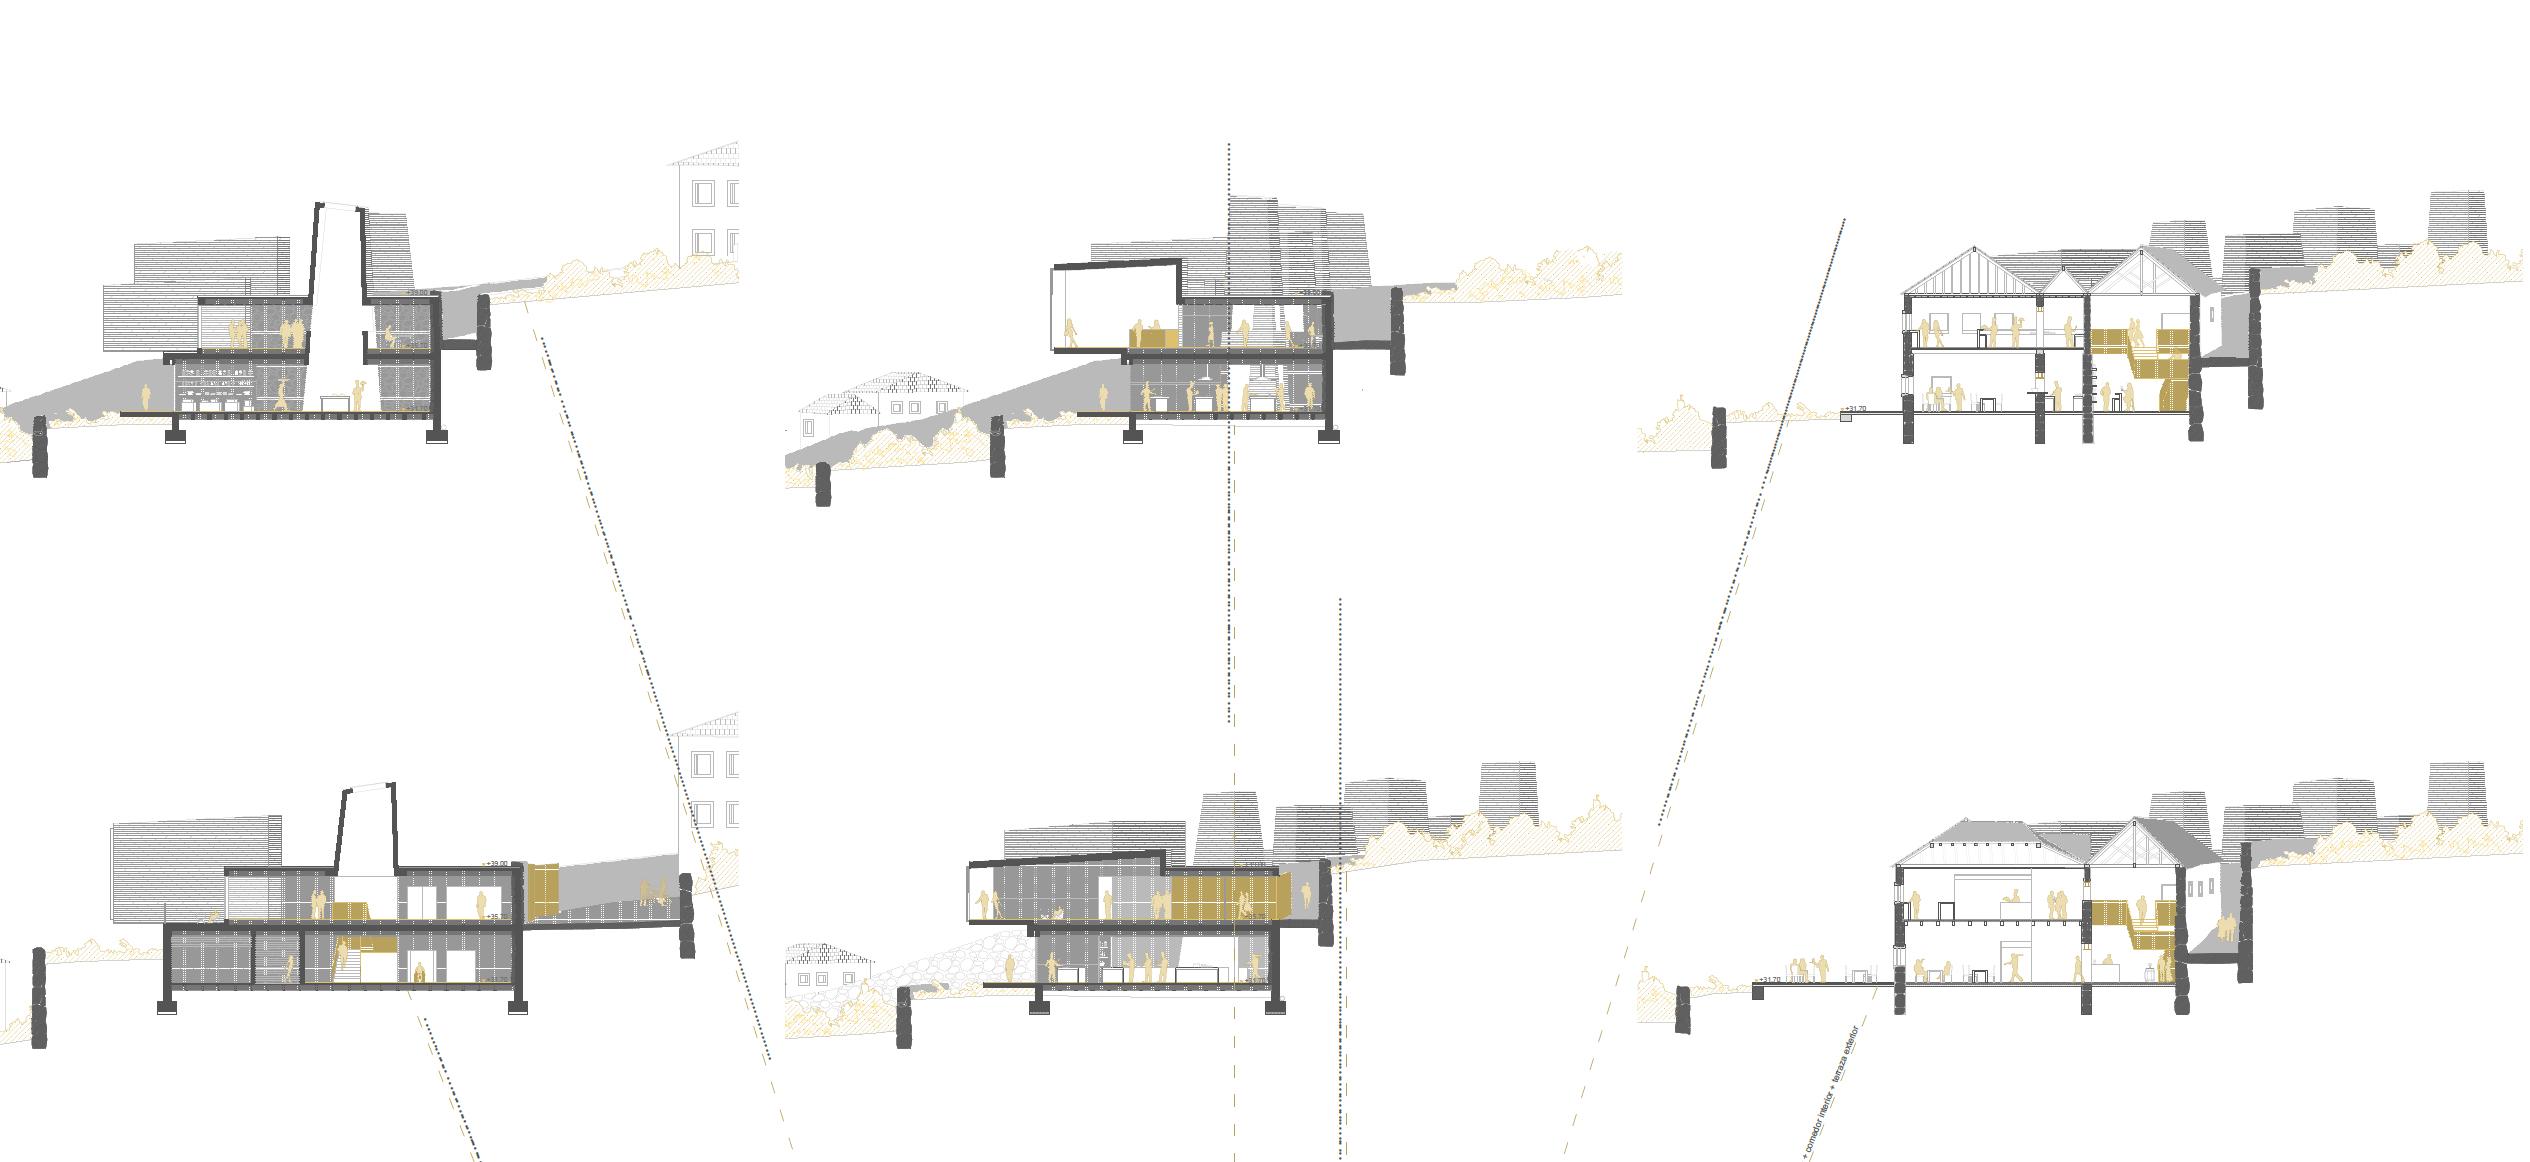 1000 proyectos pfc worksdifferent arquitectura for Cocina definicion arquitectura